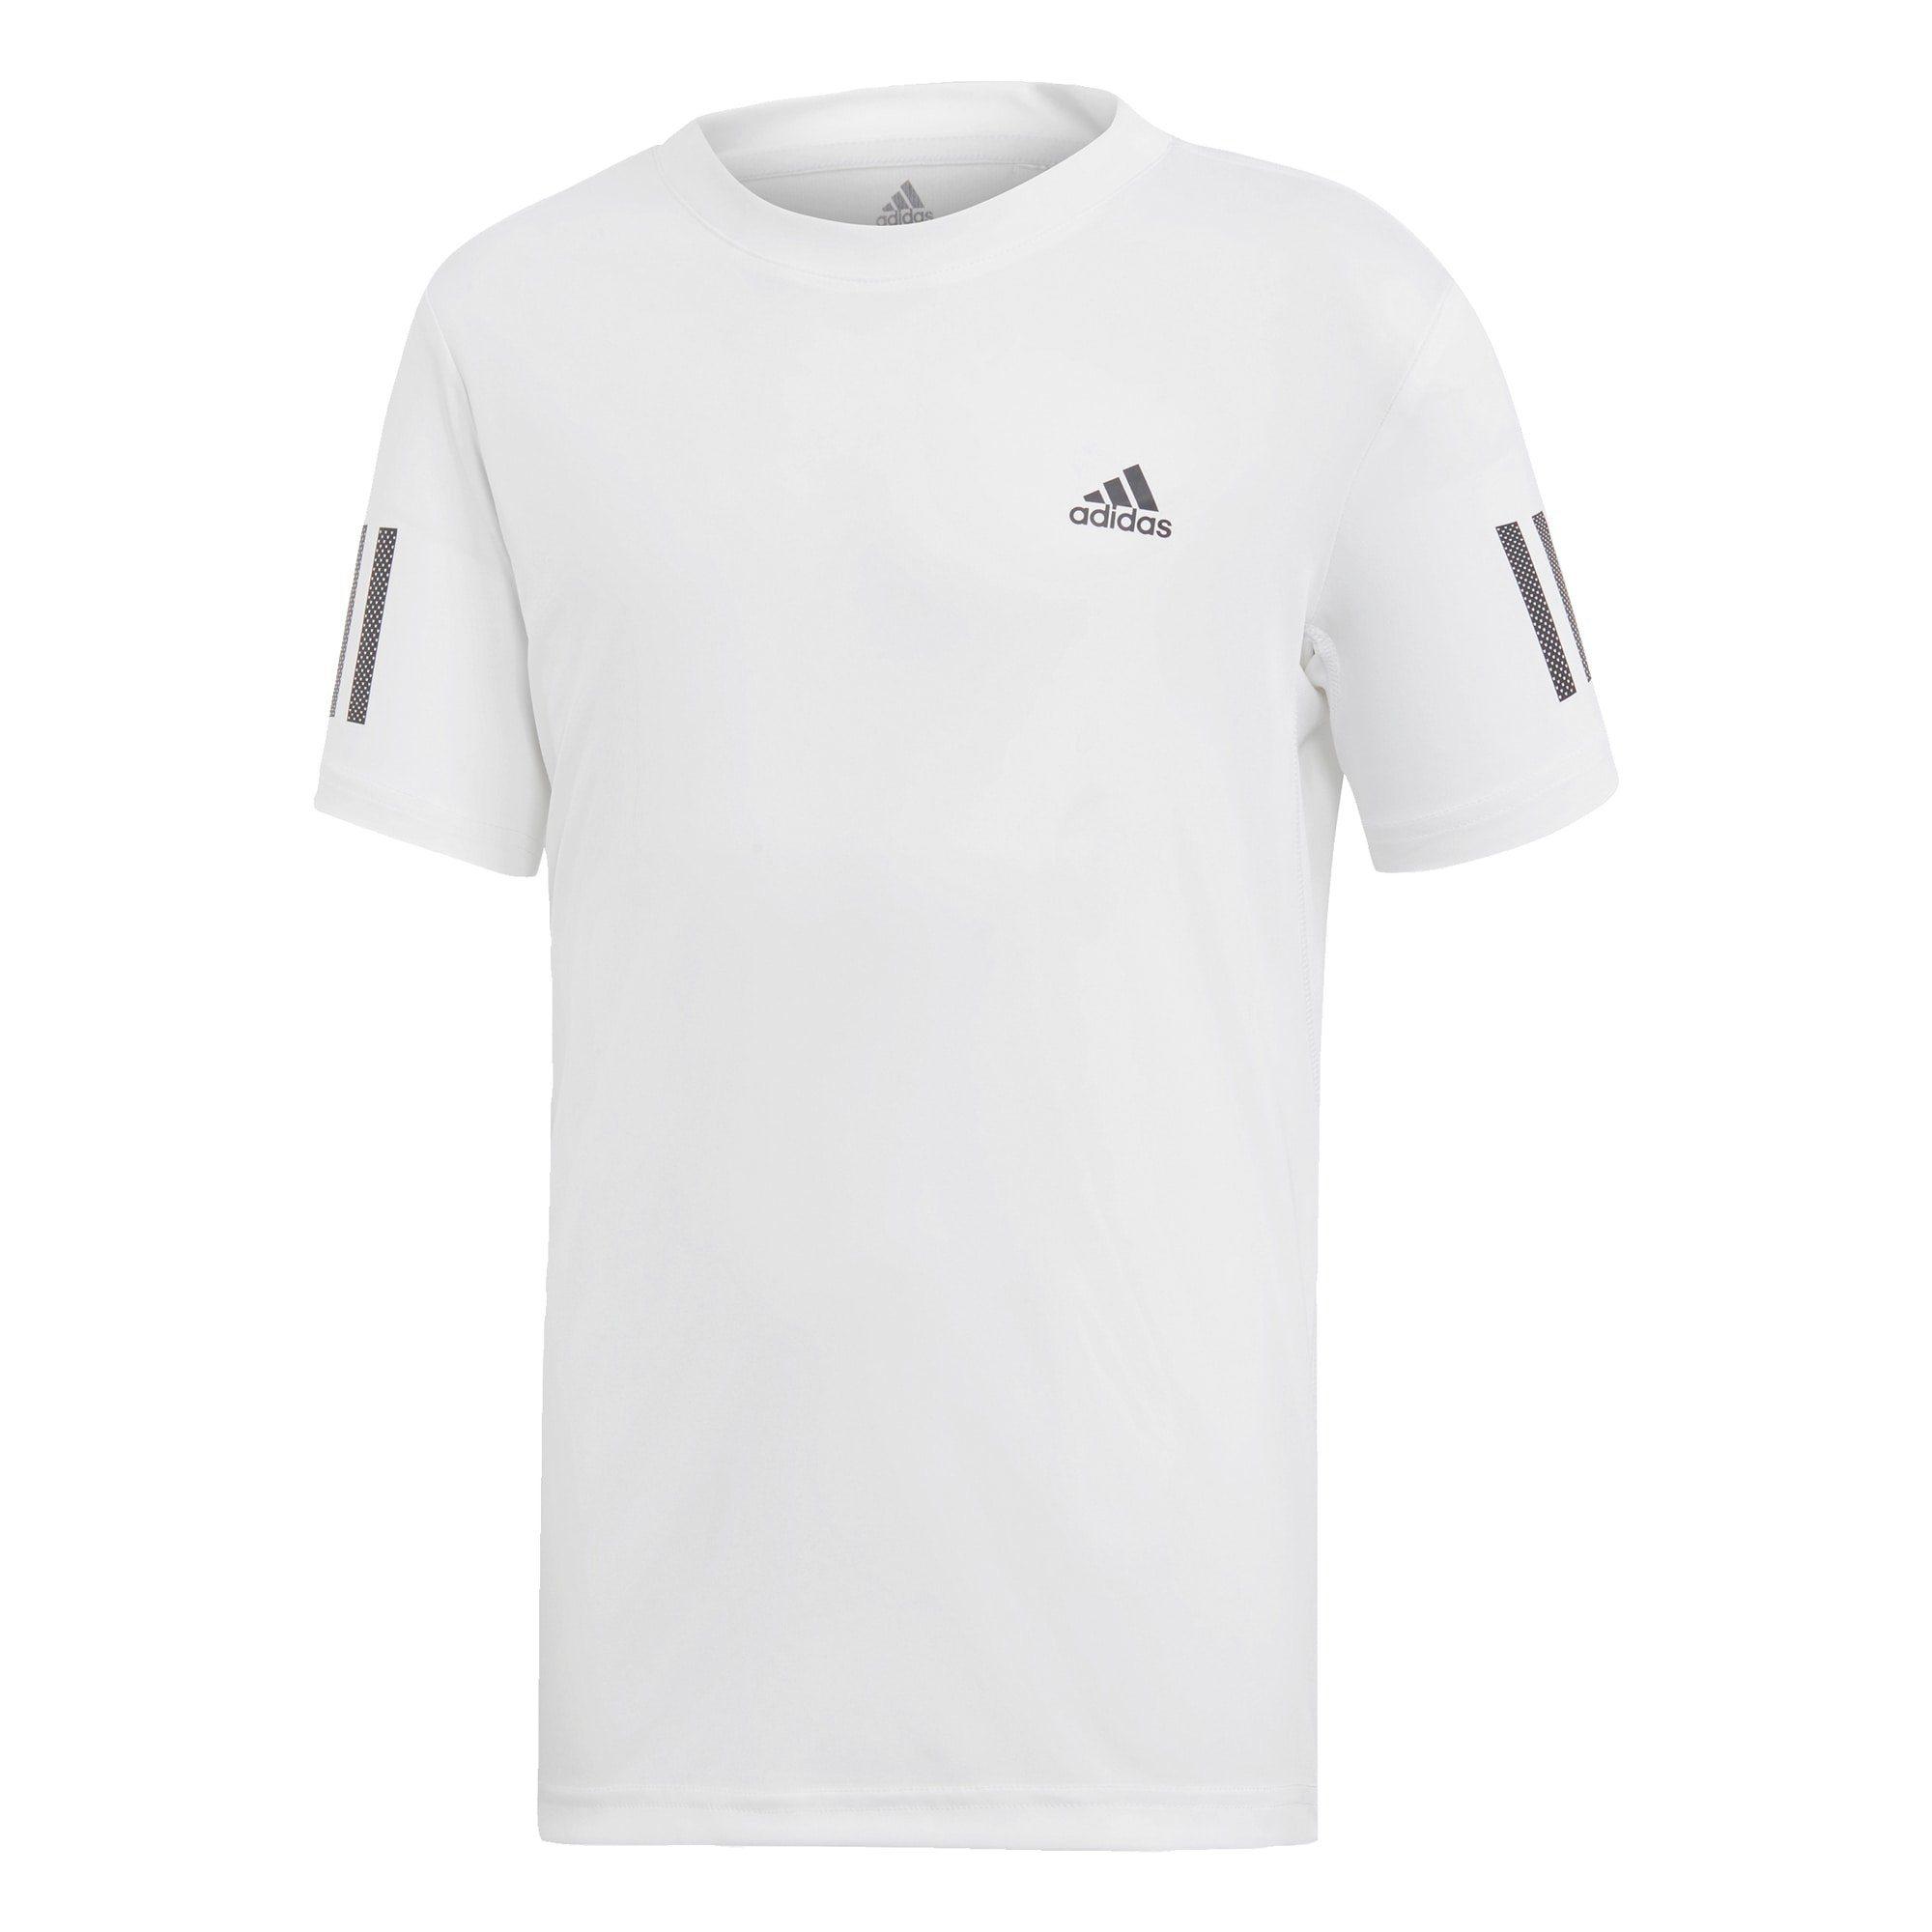 adidas Performance T Shirt »3 Streifen Club T Shirt« RDY;Clima online kaufen   OTTO